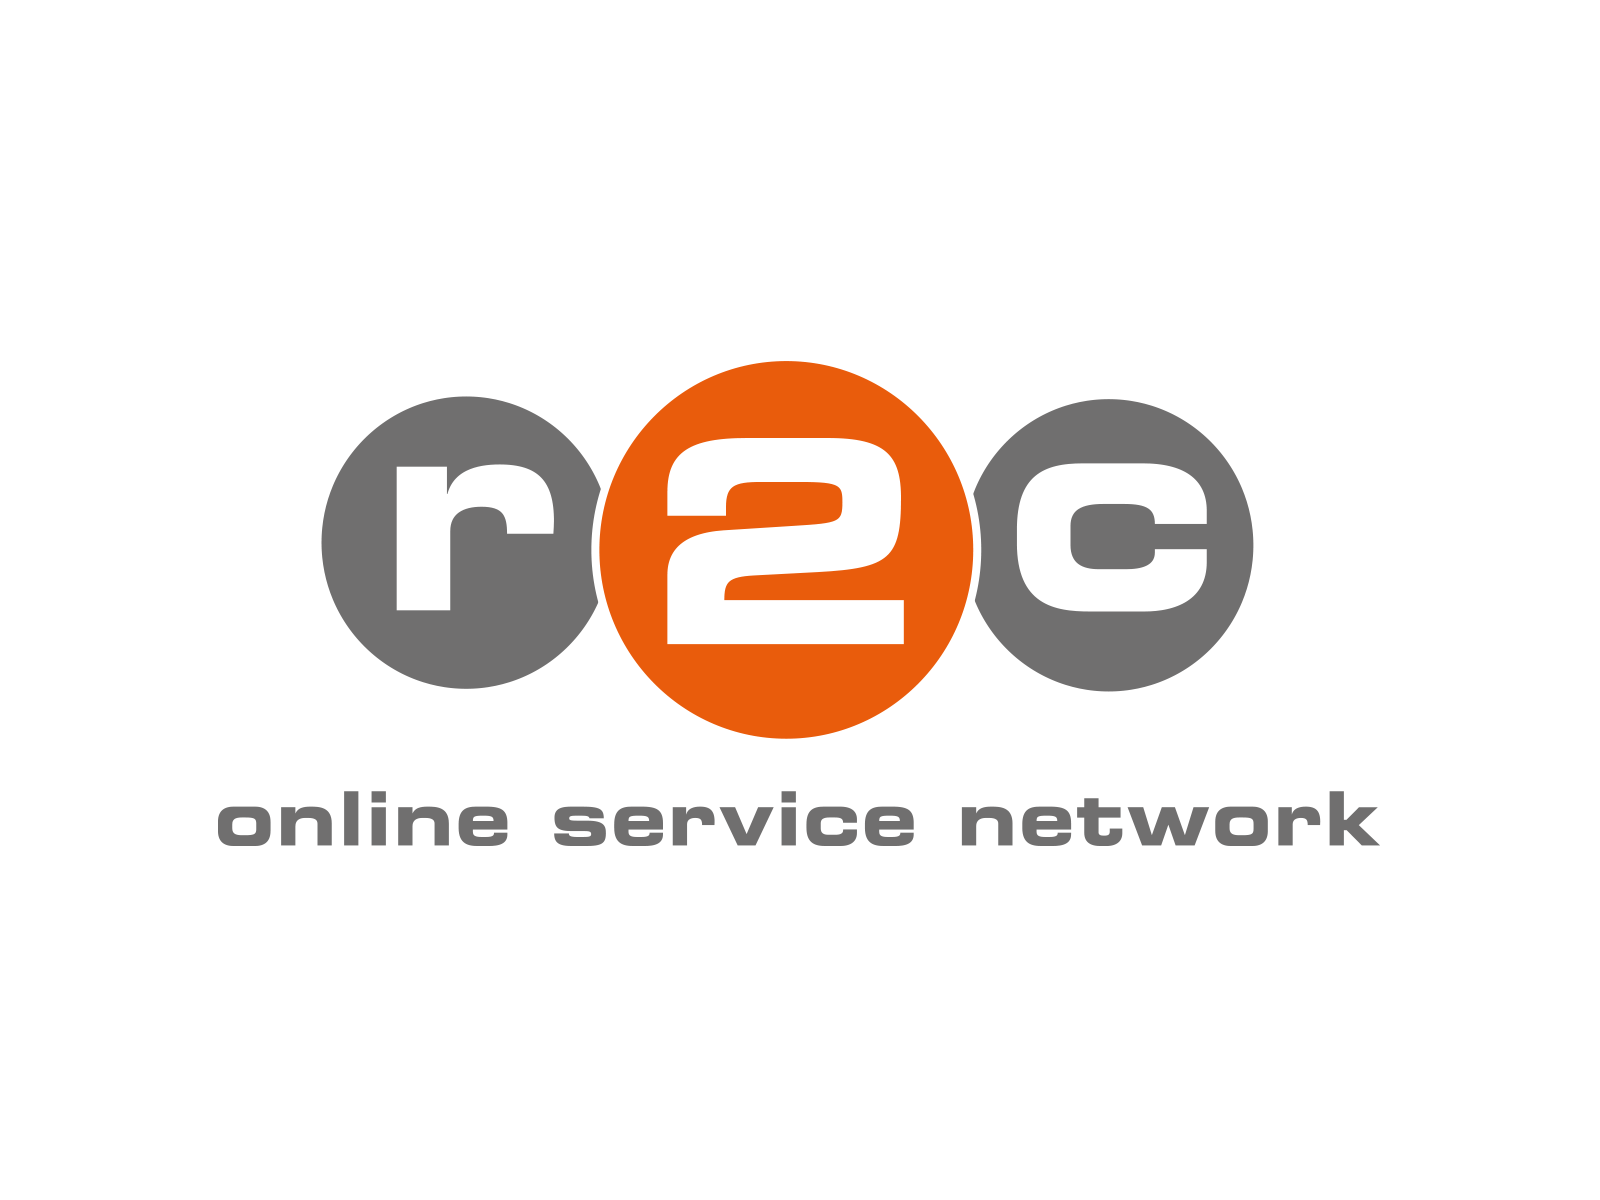 Business Partner R2c